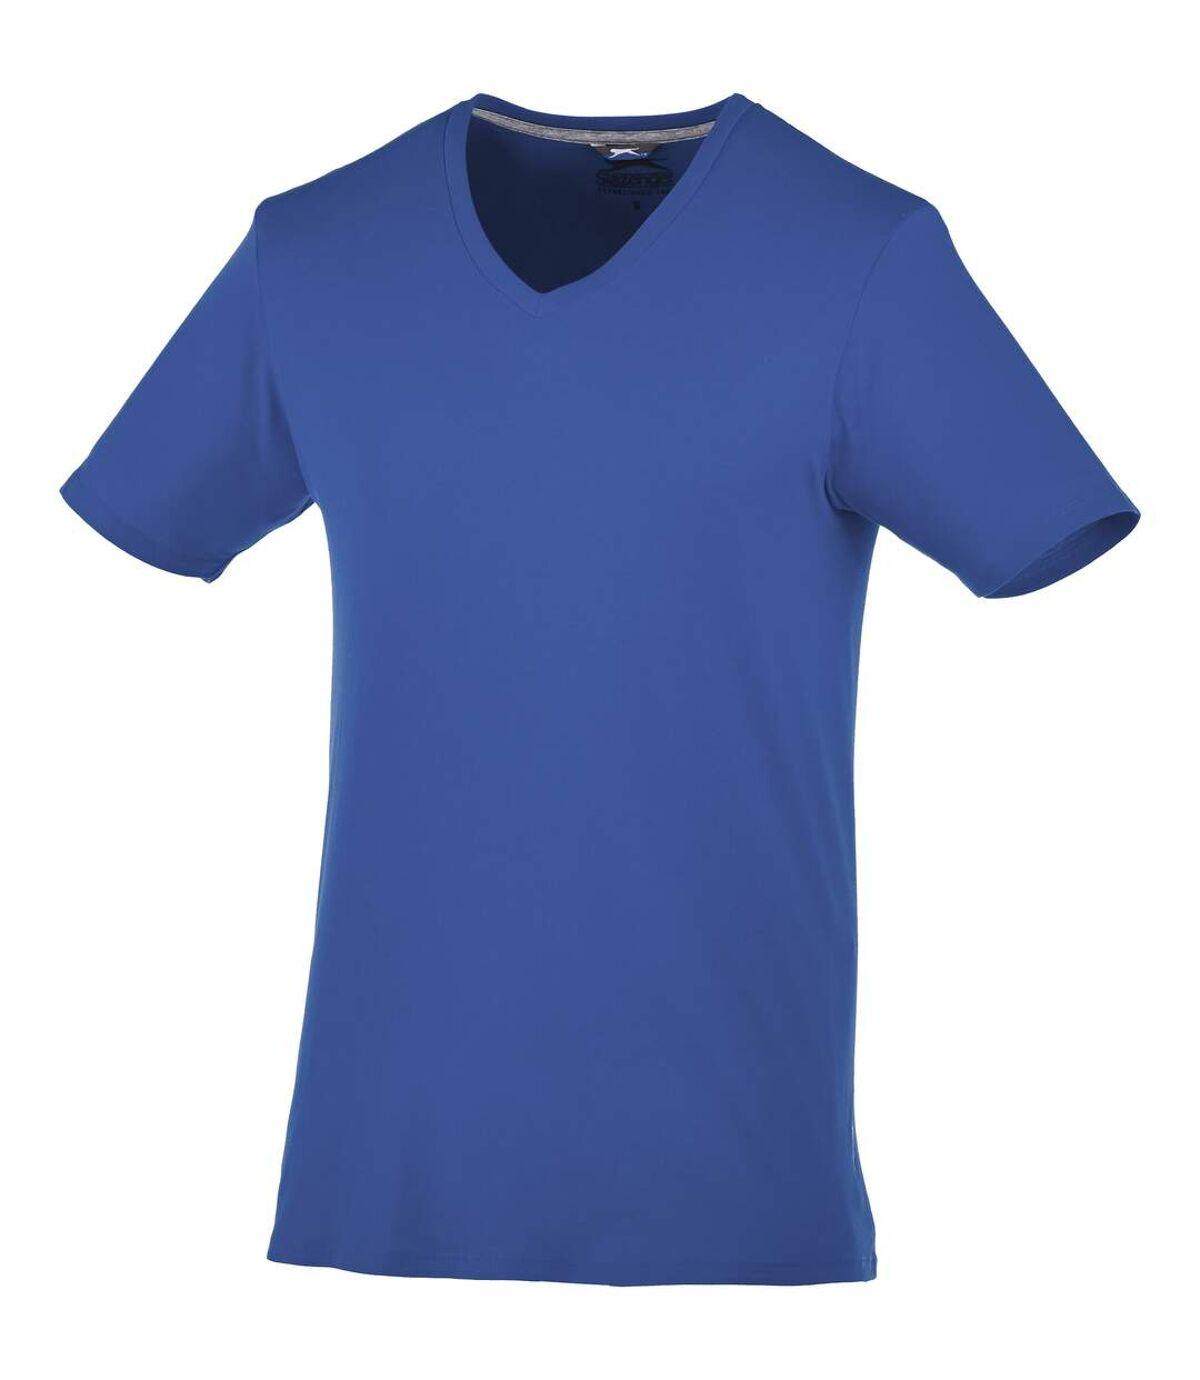 Slazenger - T-shirt manches courtes BOSEY - Homme (Bleu marine) - UTPF1732